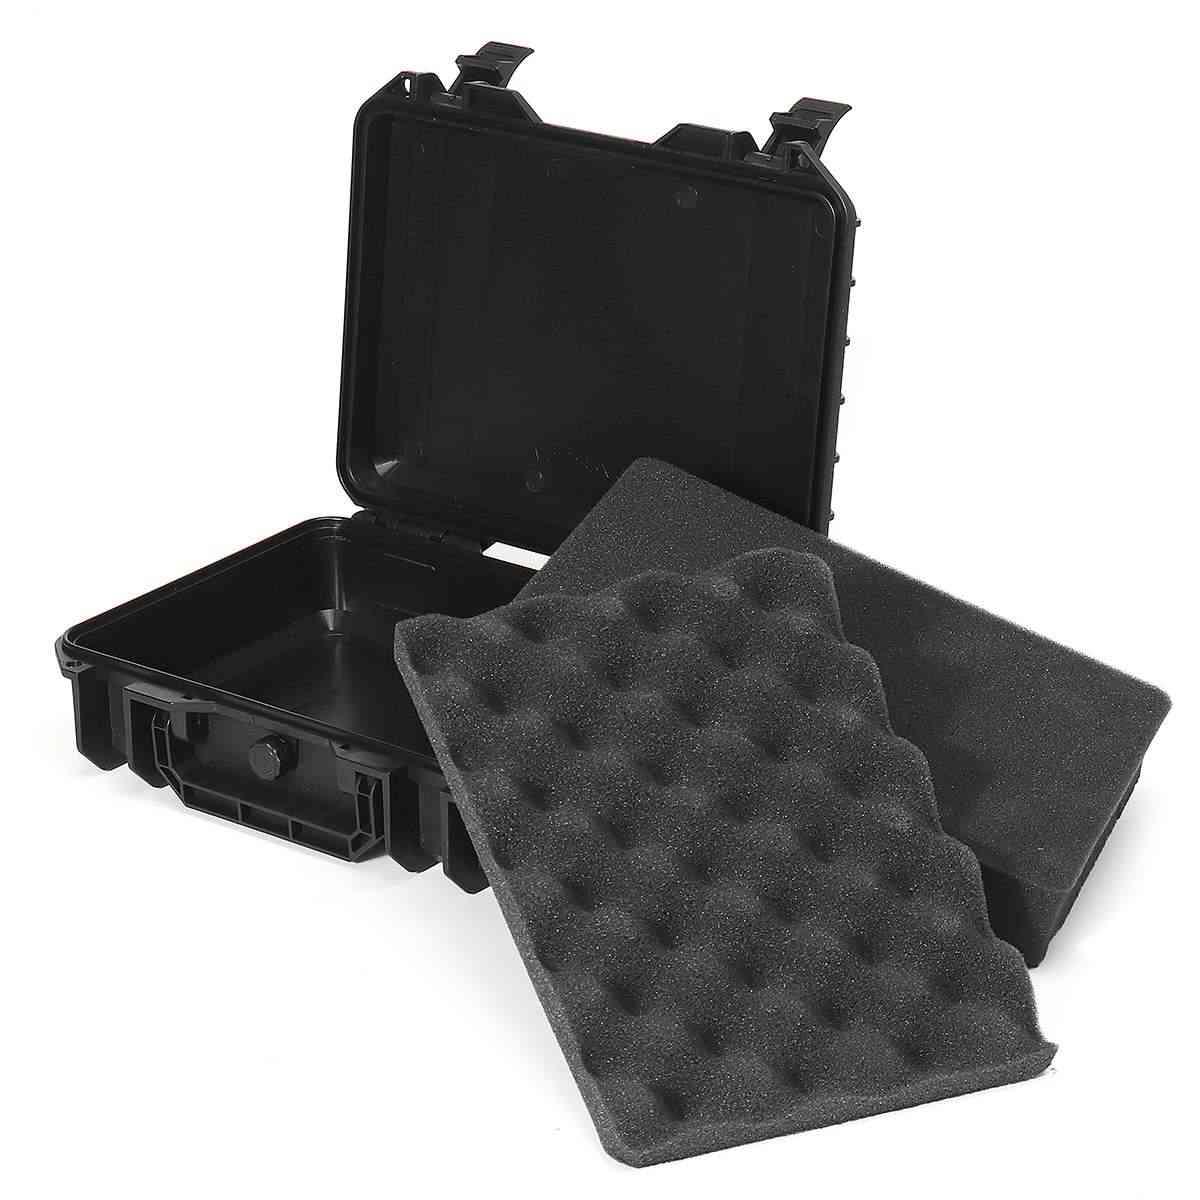 Waterproof Hard Carry Case Bag Tool Kit With Sponge Storage Box